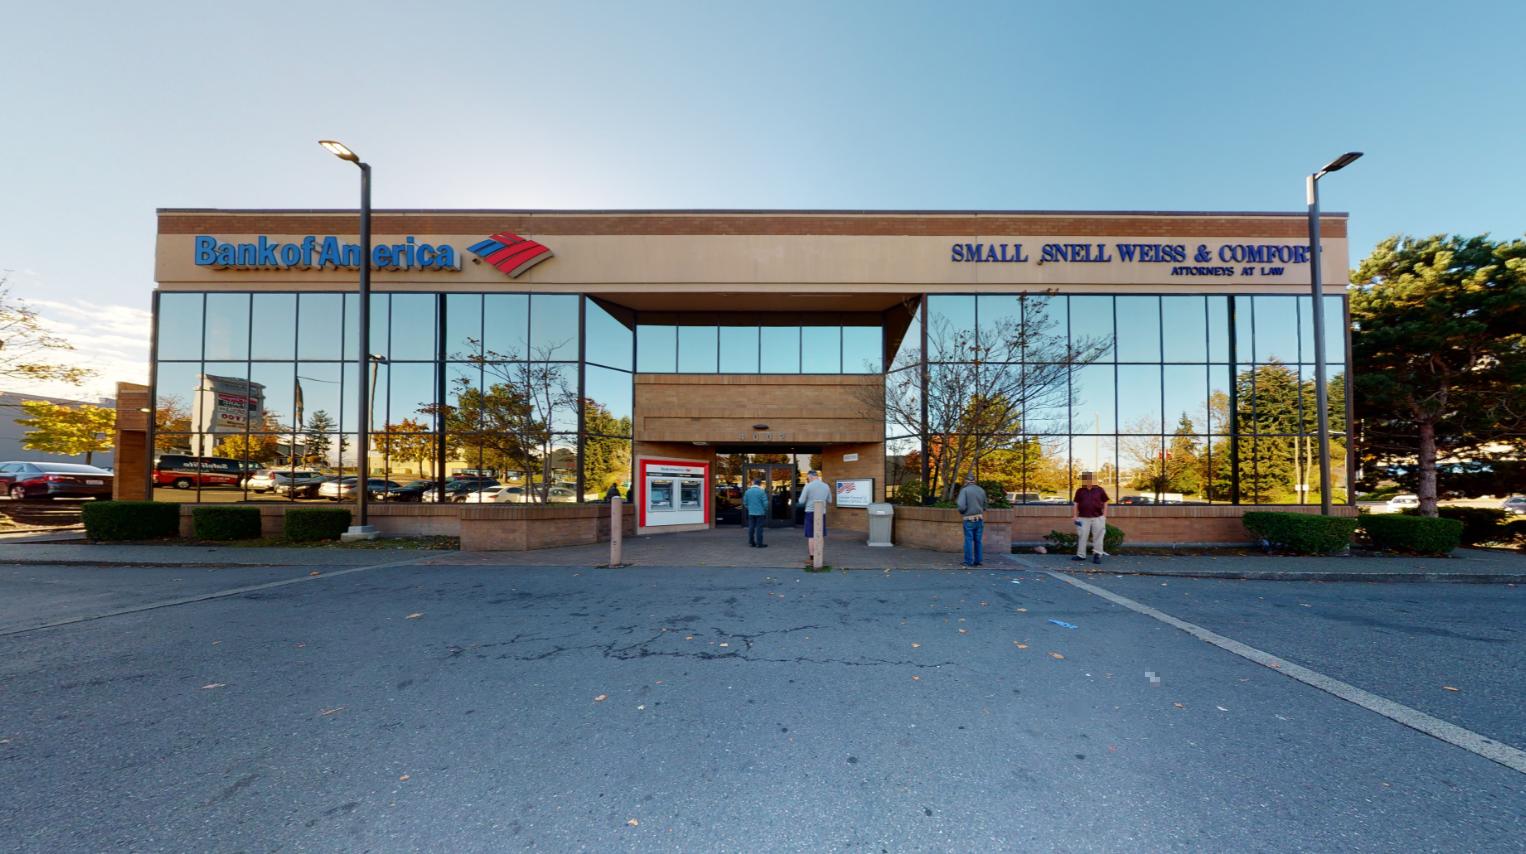 Bank of America financial center with walk-up ATM   4002 Tacoma Mall Blvd, Tacoma, WA 98409